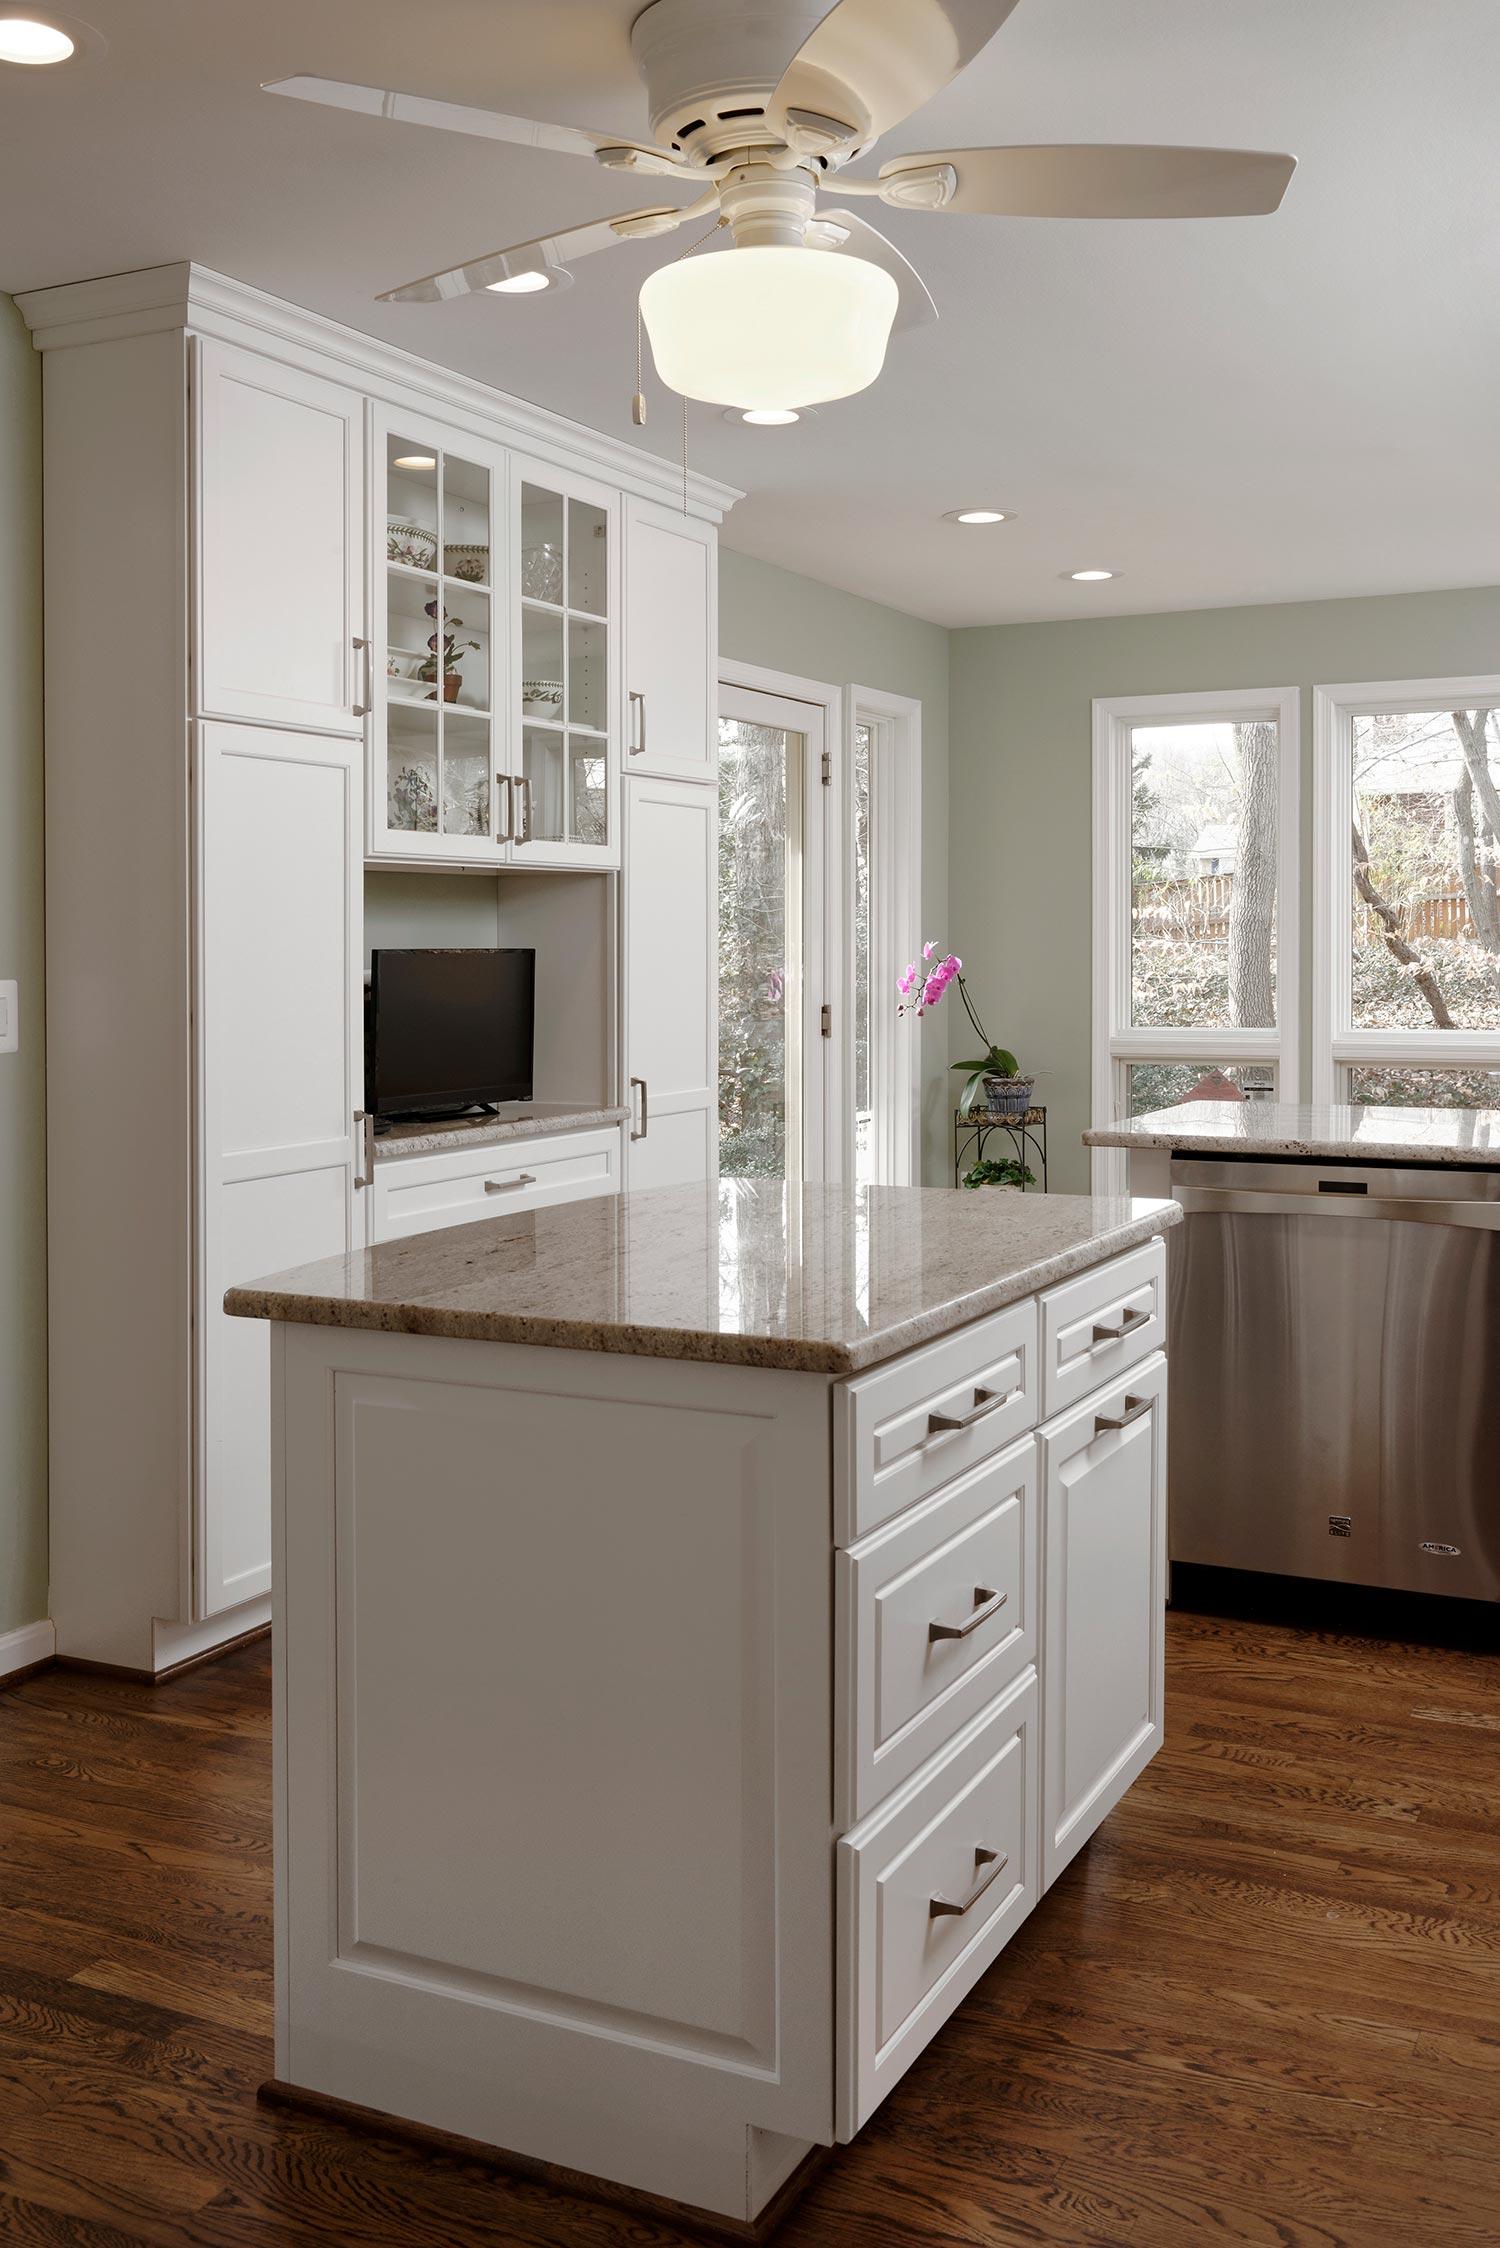 millennial cream granite countertops